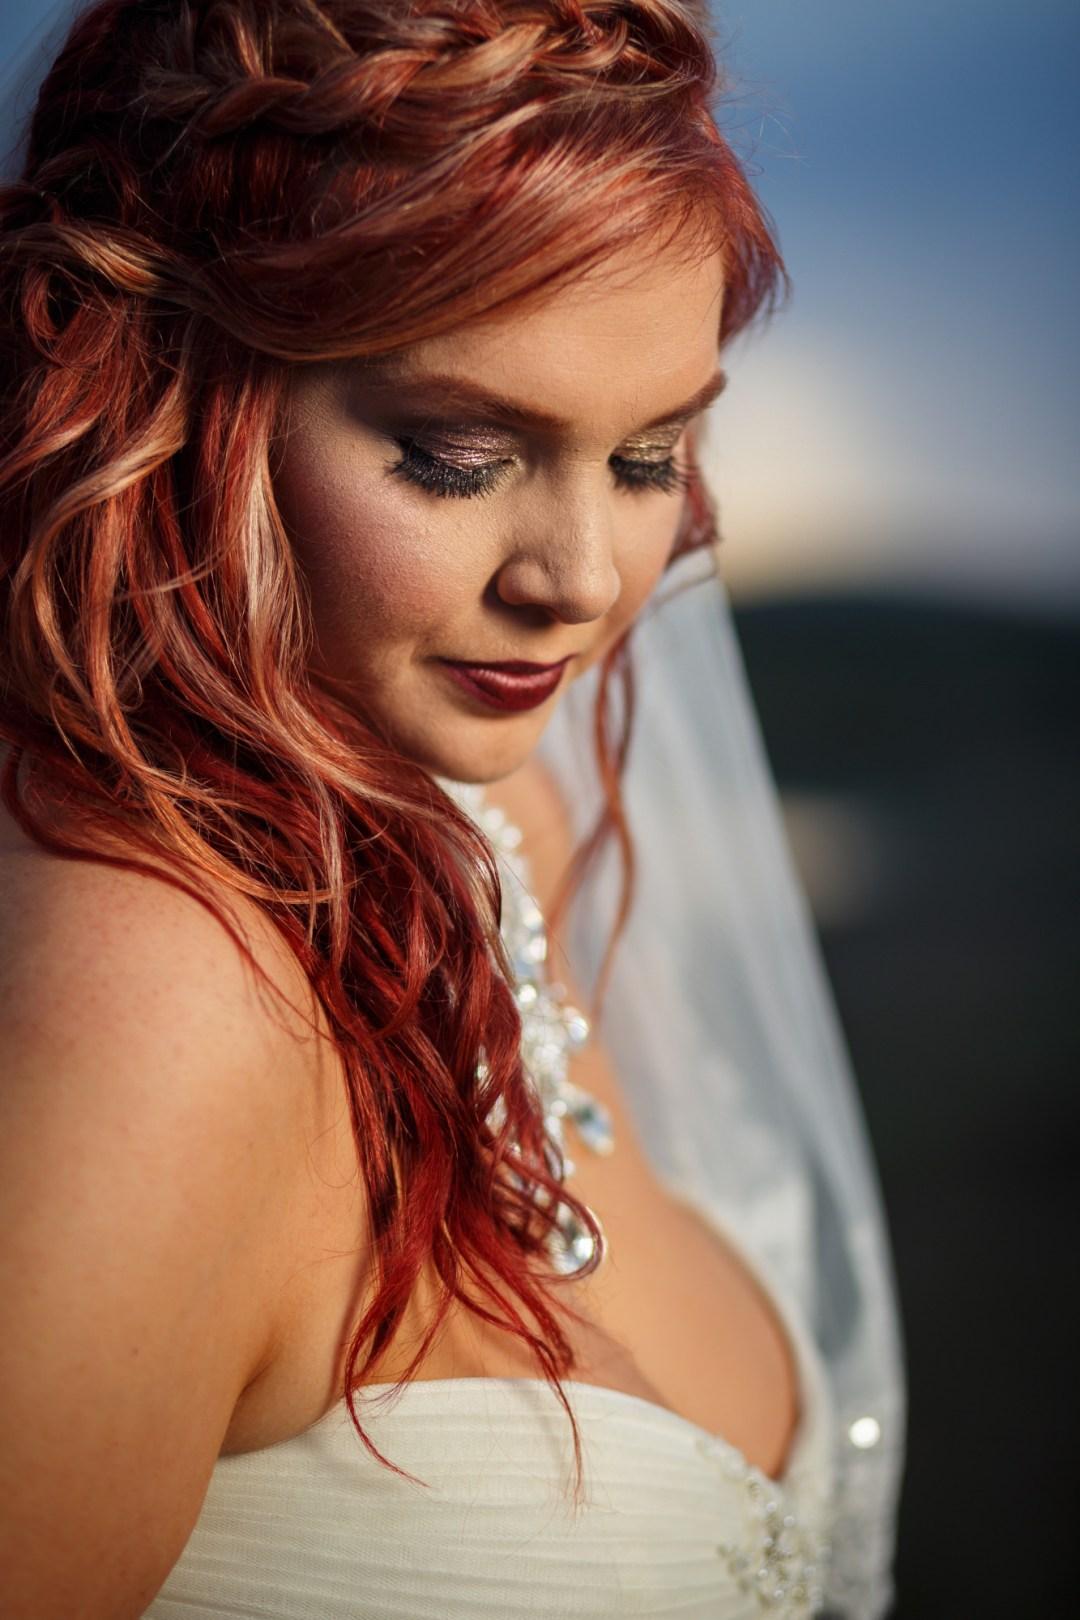 Austin Giraffe Bridal Portrait - Austin Wedding Photographer - Epic Bridal Portraits